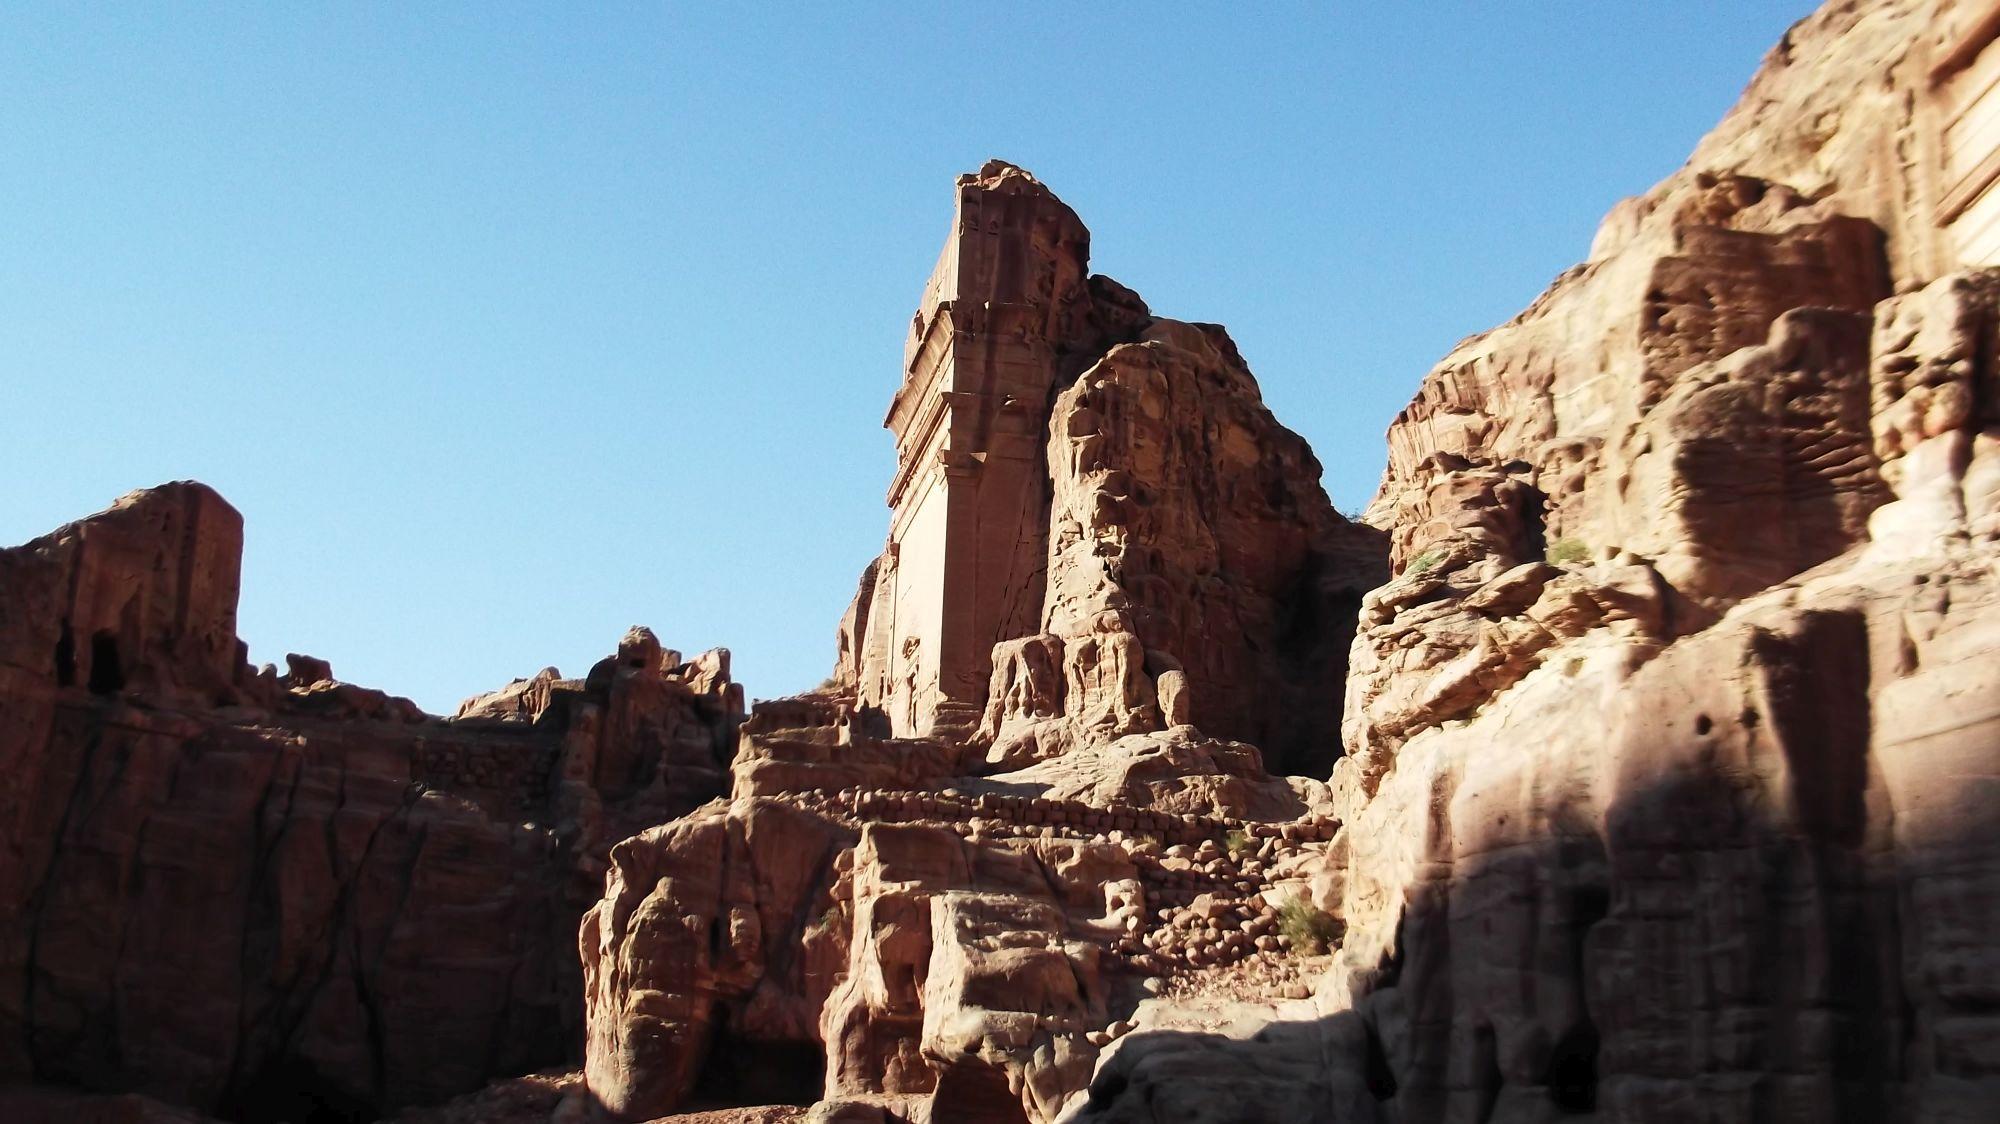 Jordania - Petra część 3 - zdjęcia, atrakcje